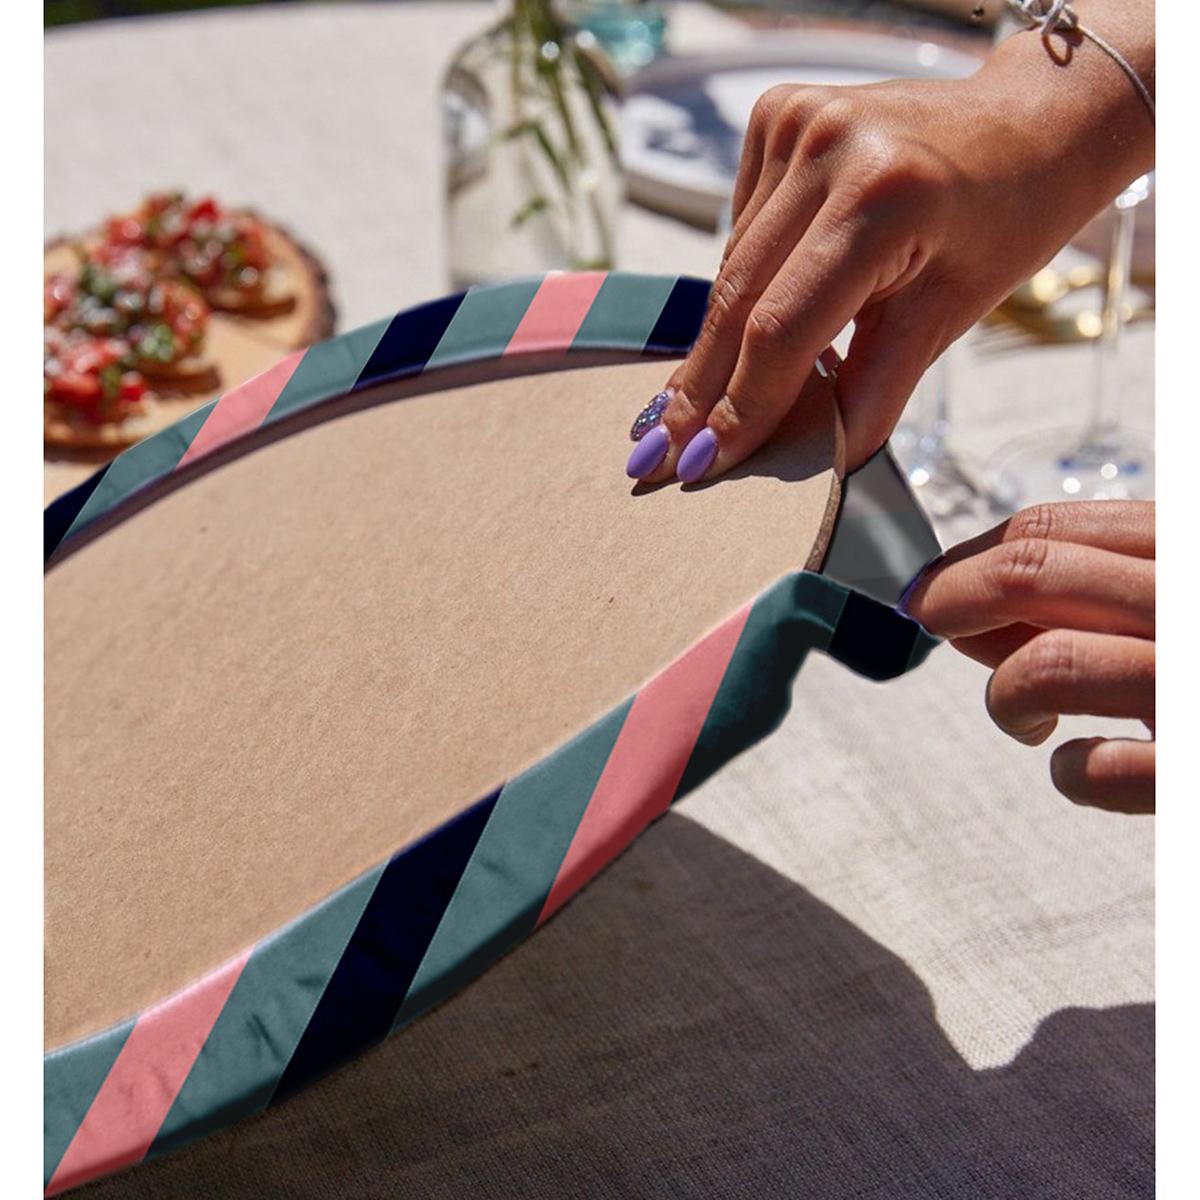 Realhomes Renkli Zemin Üzerinde Pastel Renkli Yatay Çizgili Modern 2'li Yuvarlak Servis Altlığı - Supla Realhomes